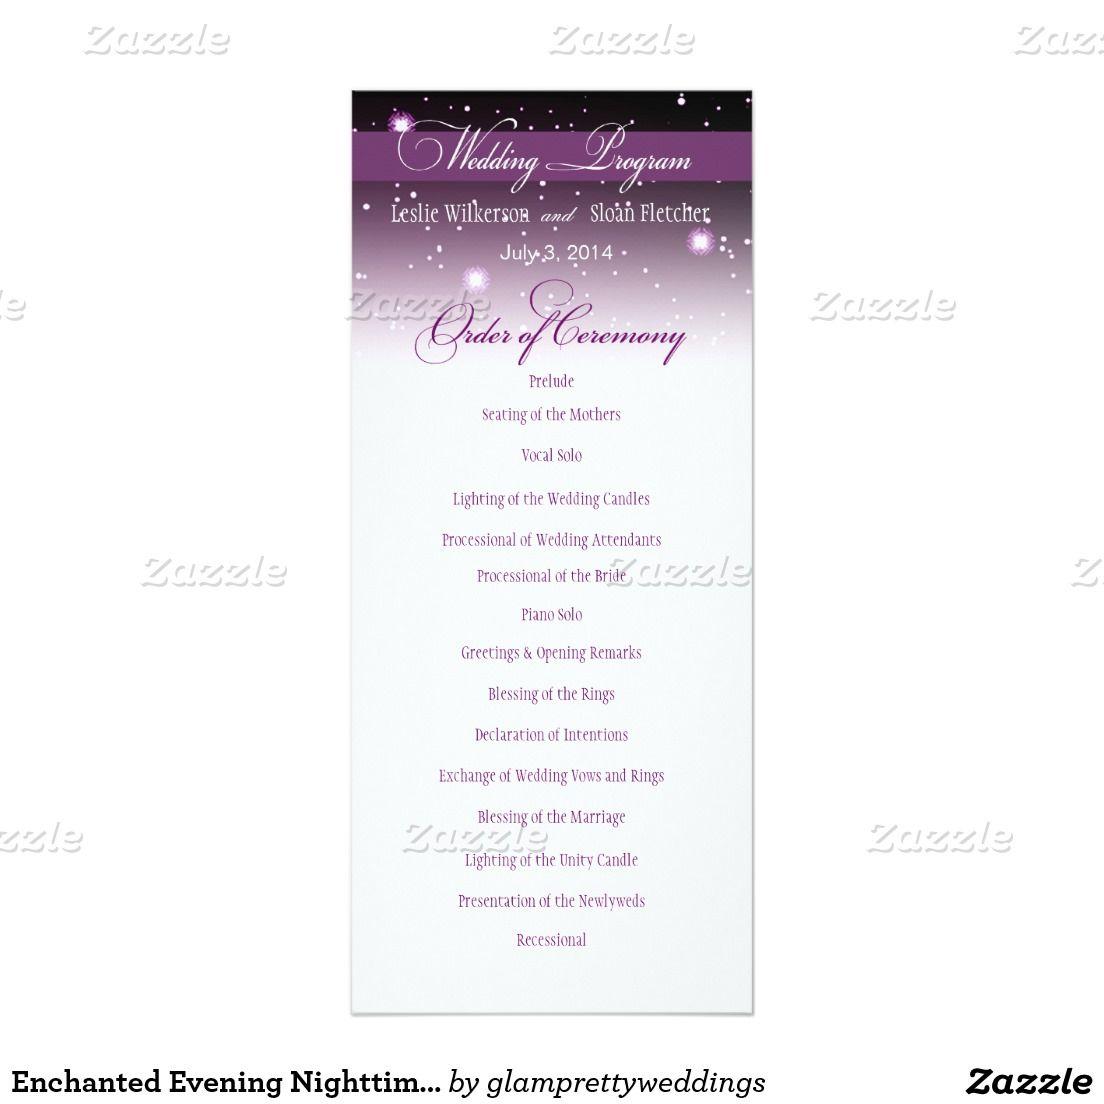 Enchanted Evening Nighttime Wedding Program 4x9.25 Paper ...